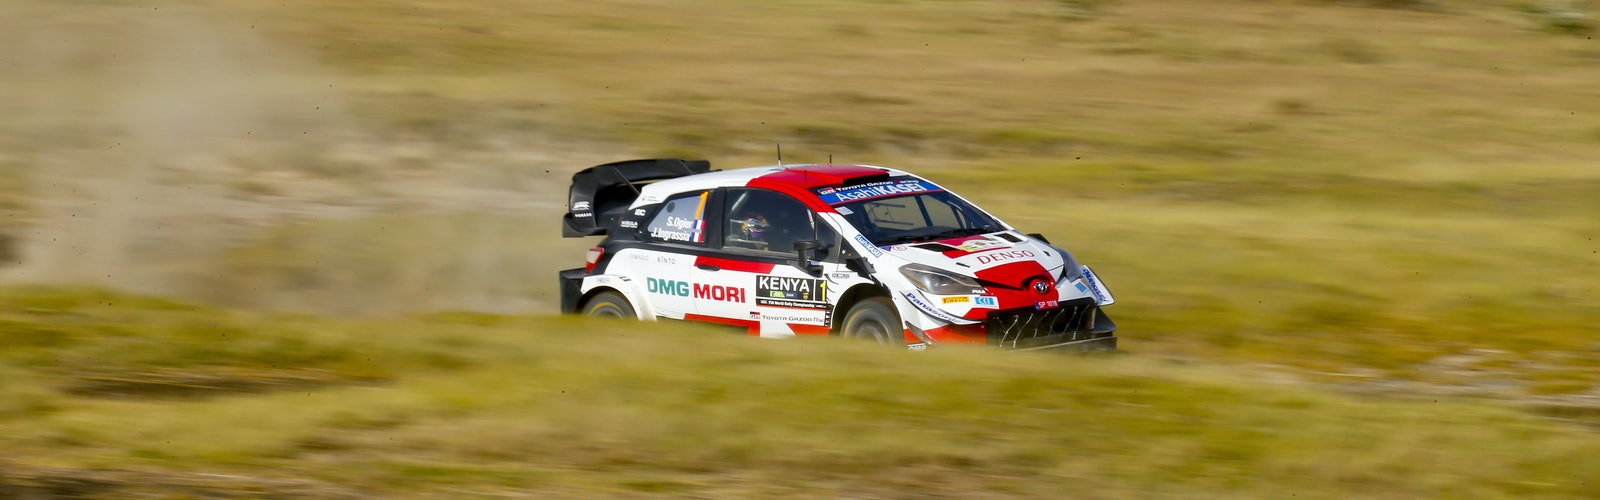 WRC_2021_Rd.6_190